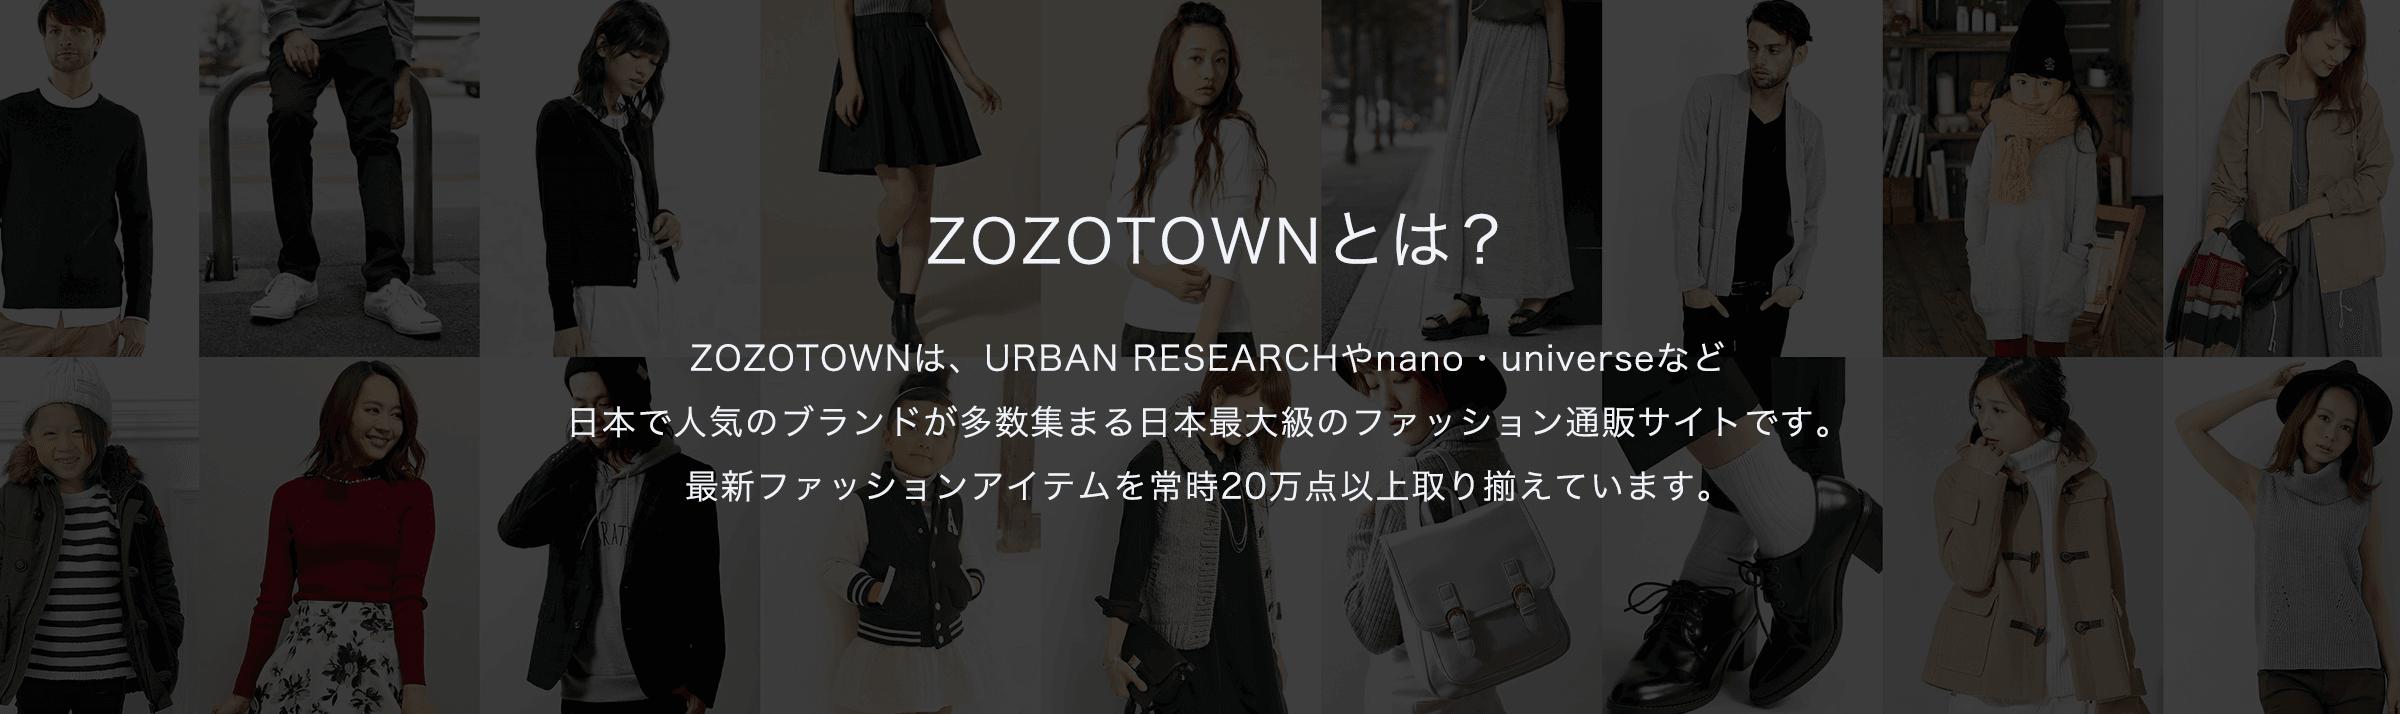 ZOZOTOWNは、URBAN RESEARCHやnano・universeなど日本で人気のブランドが多数集まる日本最大級のファッション通販サイトです。最新ファッションアイテムを常時20万点以上取り揃えています。